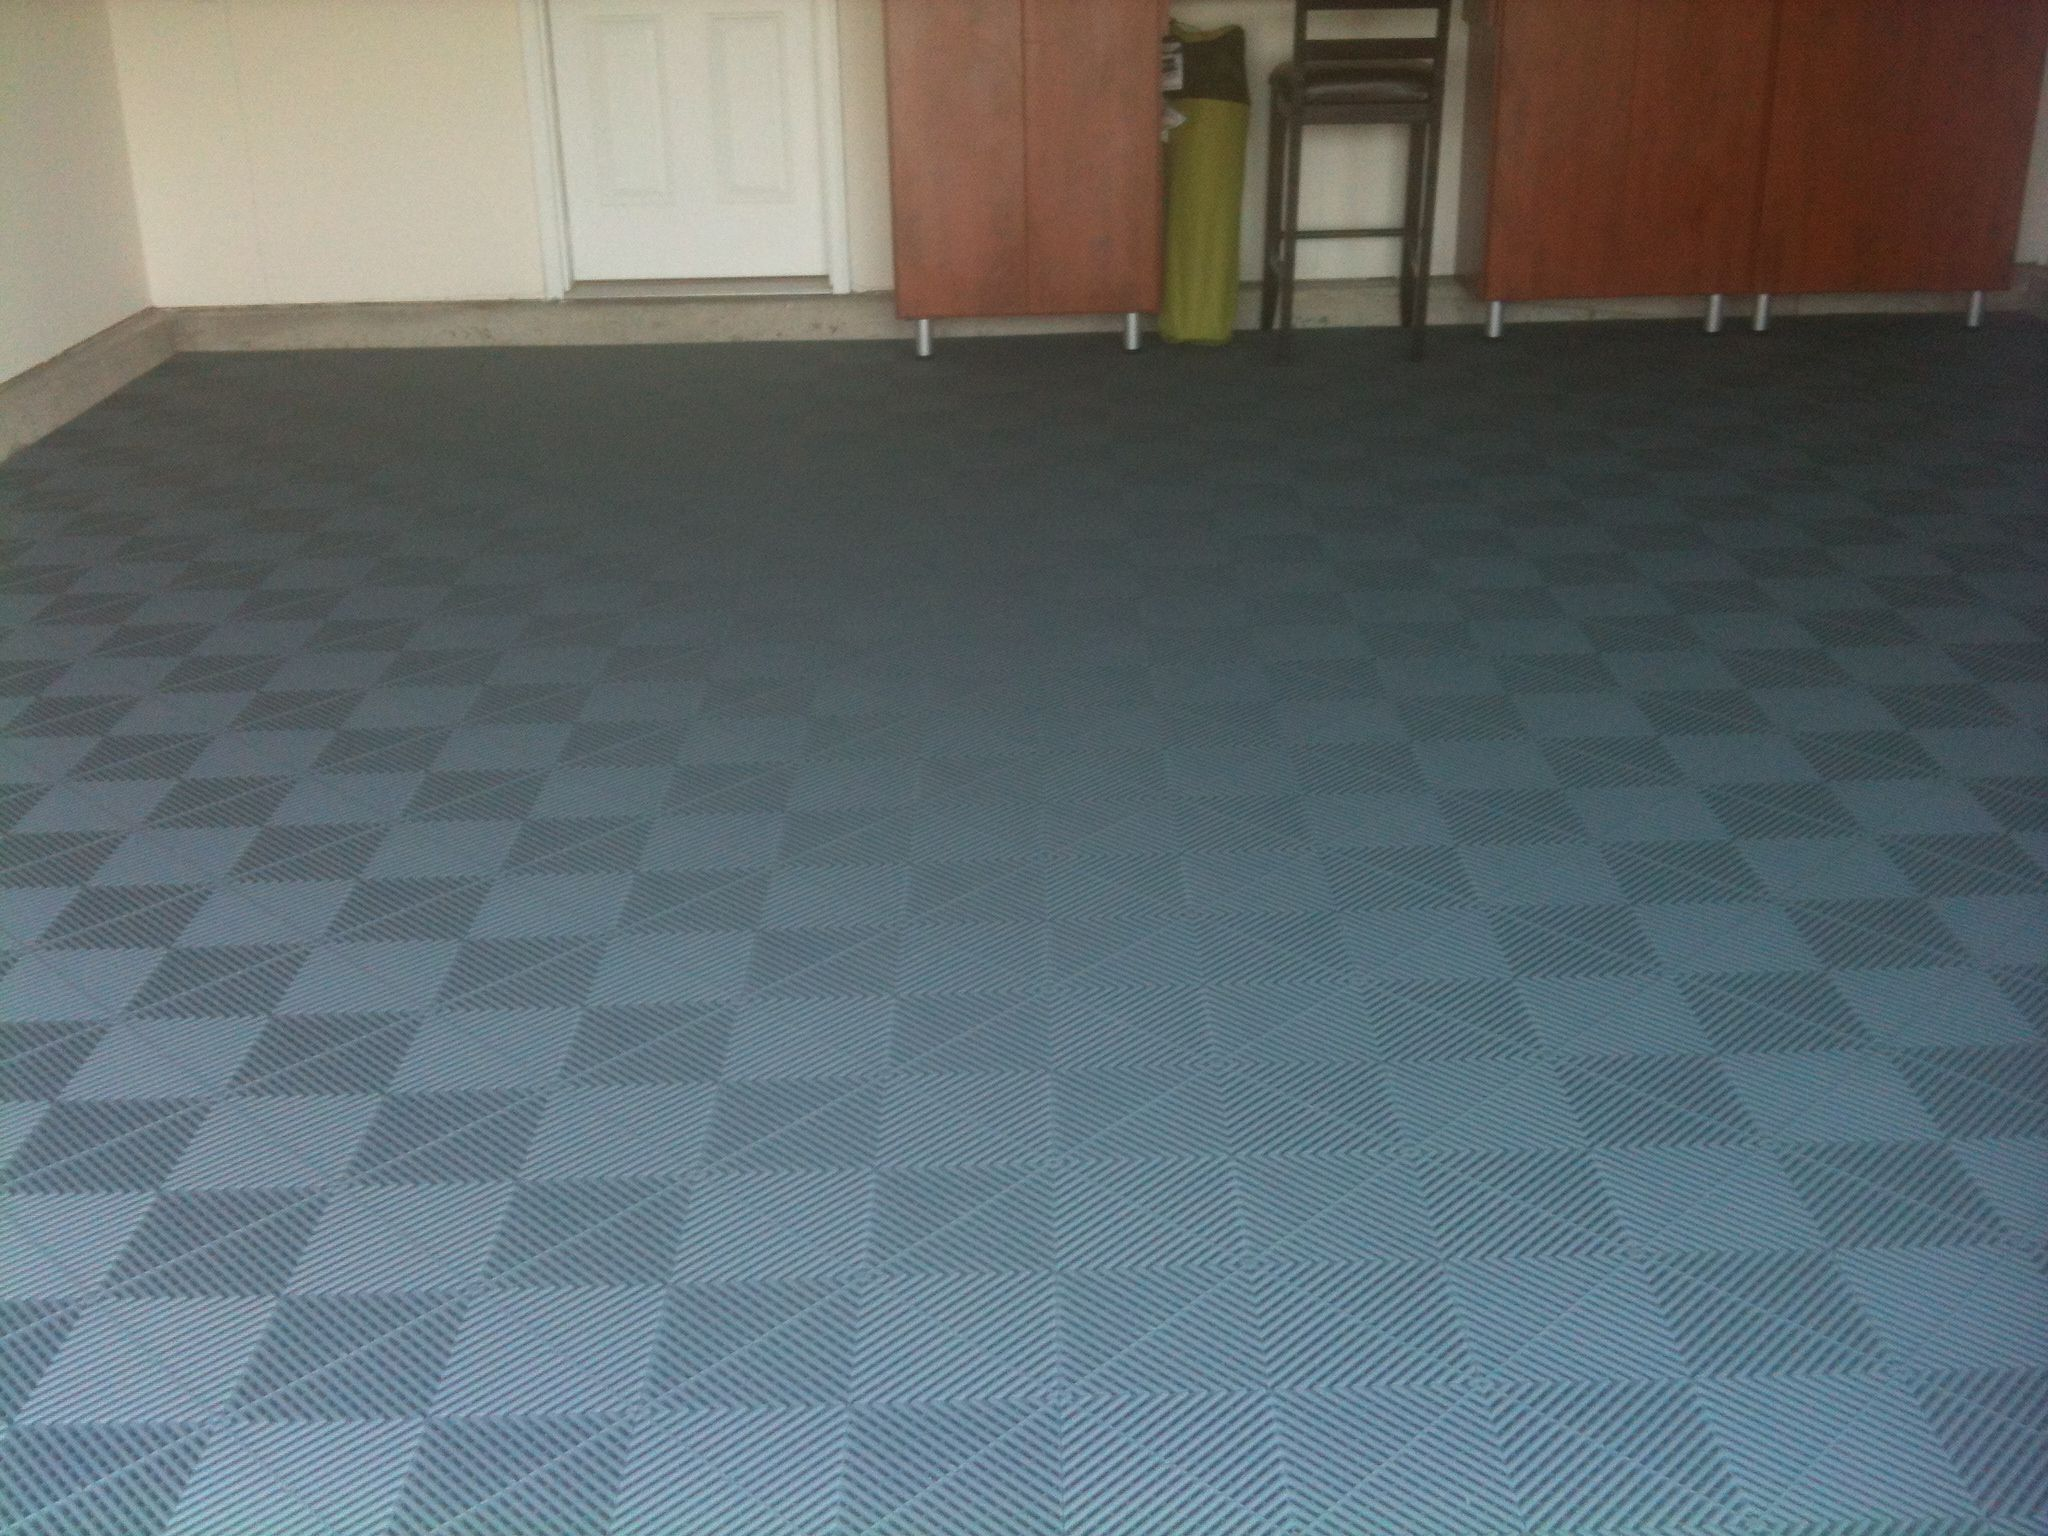 Man Cave Garage Floor : Garage flooring shop man cave pinterest